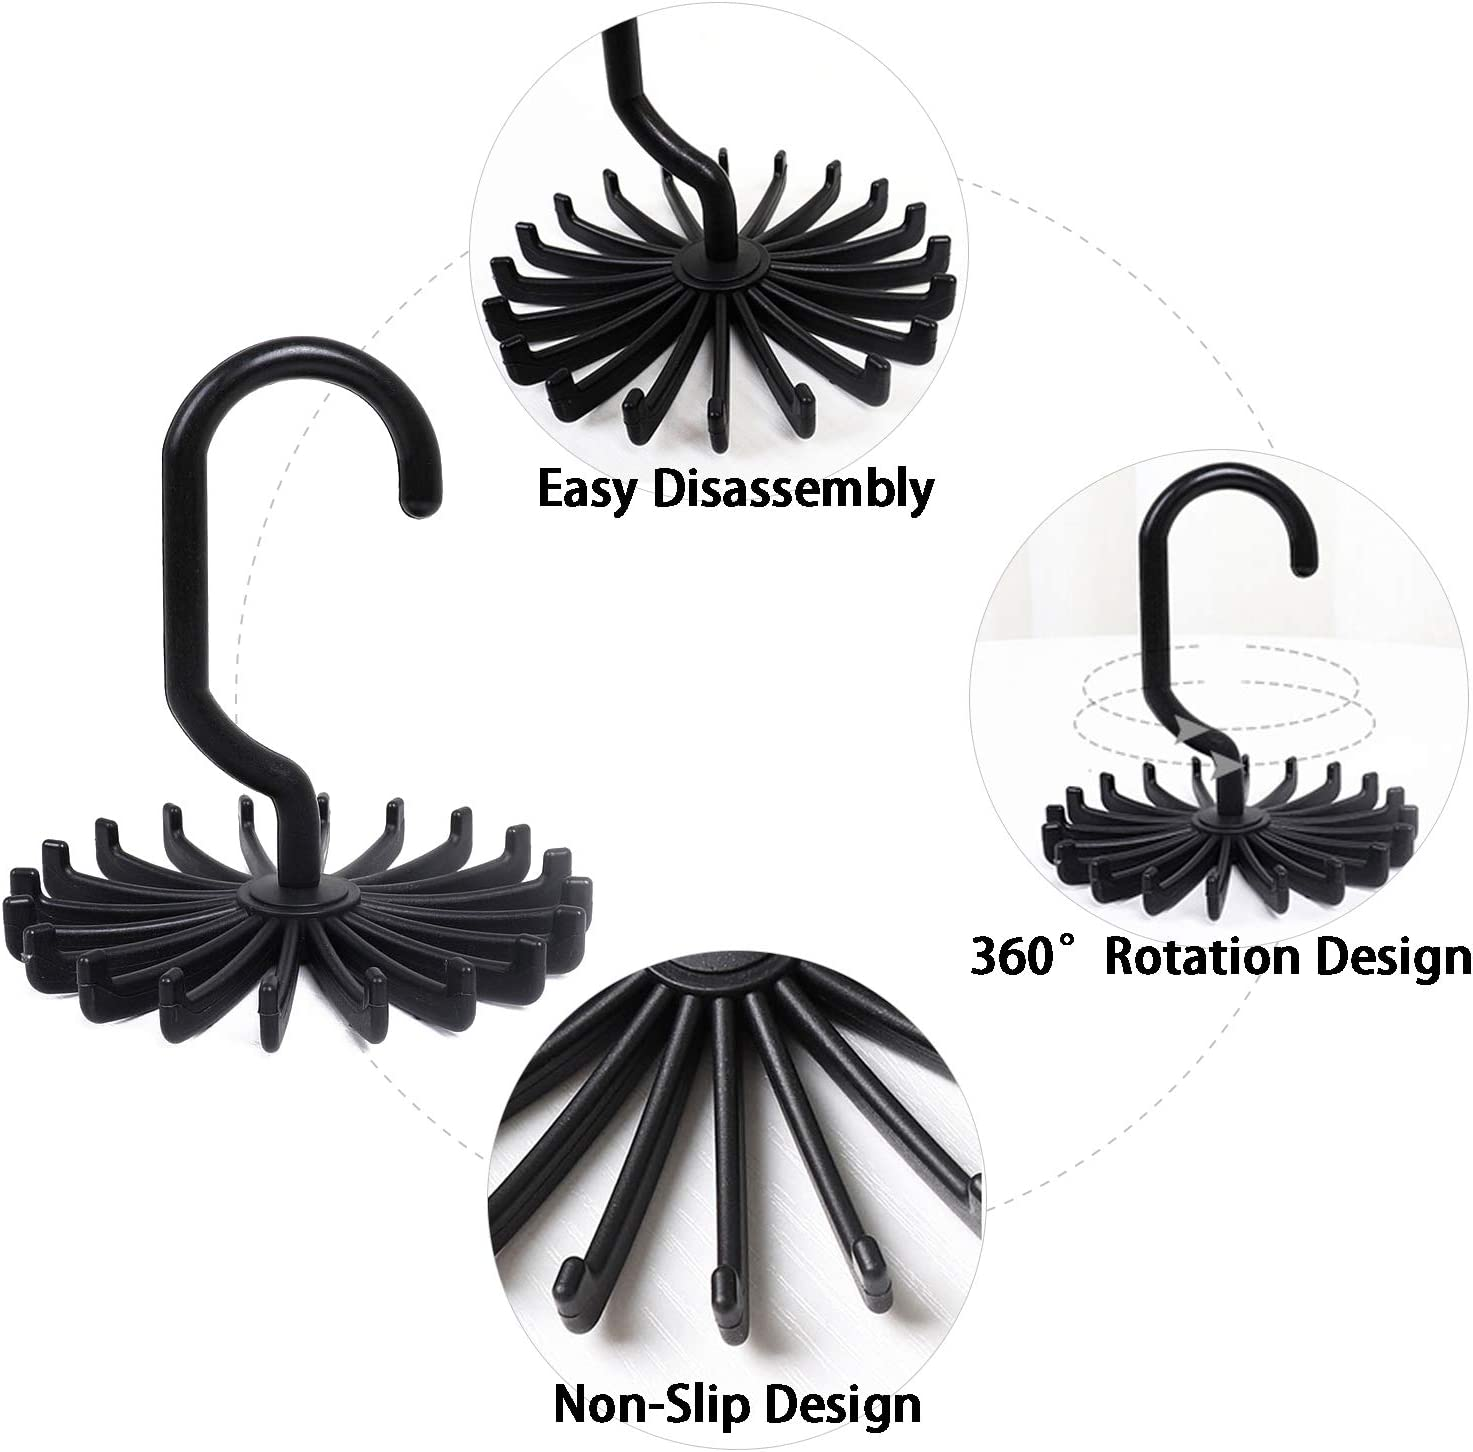 Multipurpose Organizer Gizhome 8 Pack 360 Degree Rotating Scarf Hanger Adjustable Twirl Plastic Tie Rack Tie Belt Black, 4.4 Hook Ties Scarf for Closet Storage